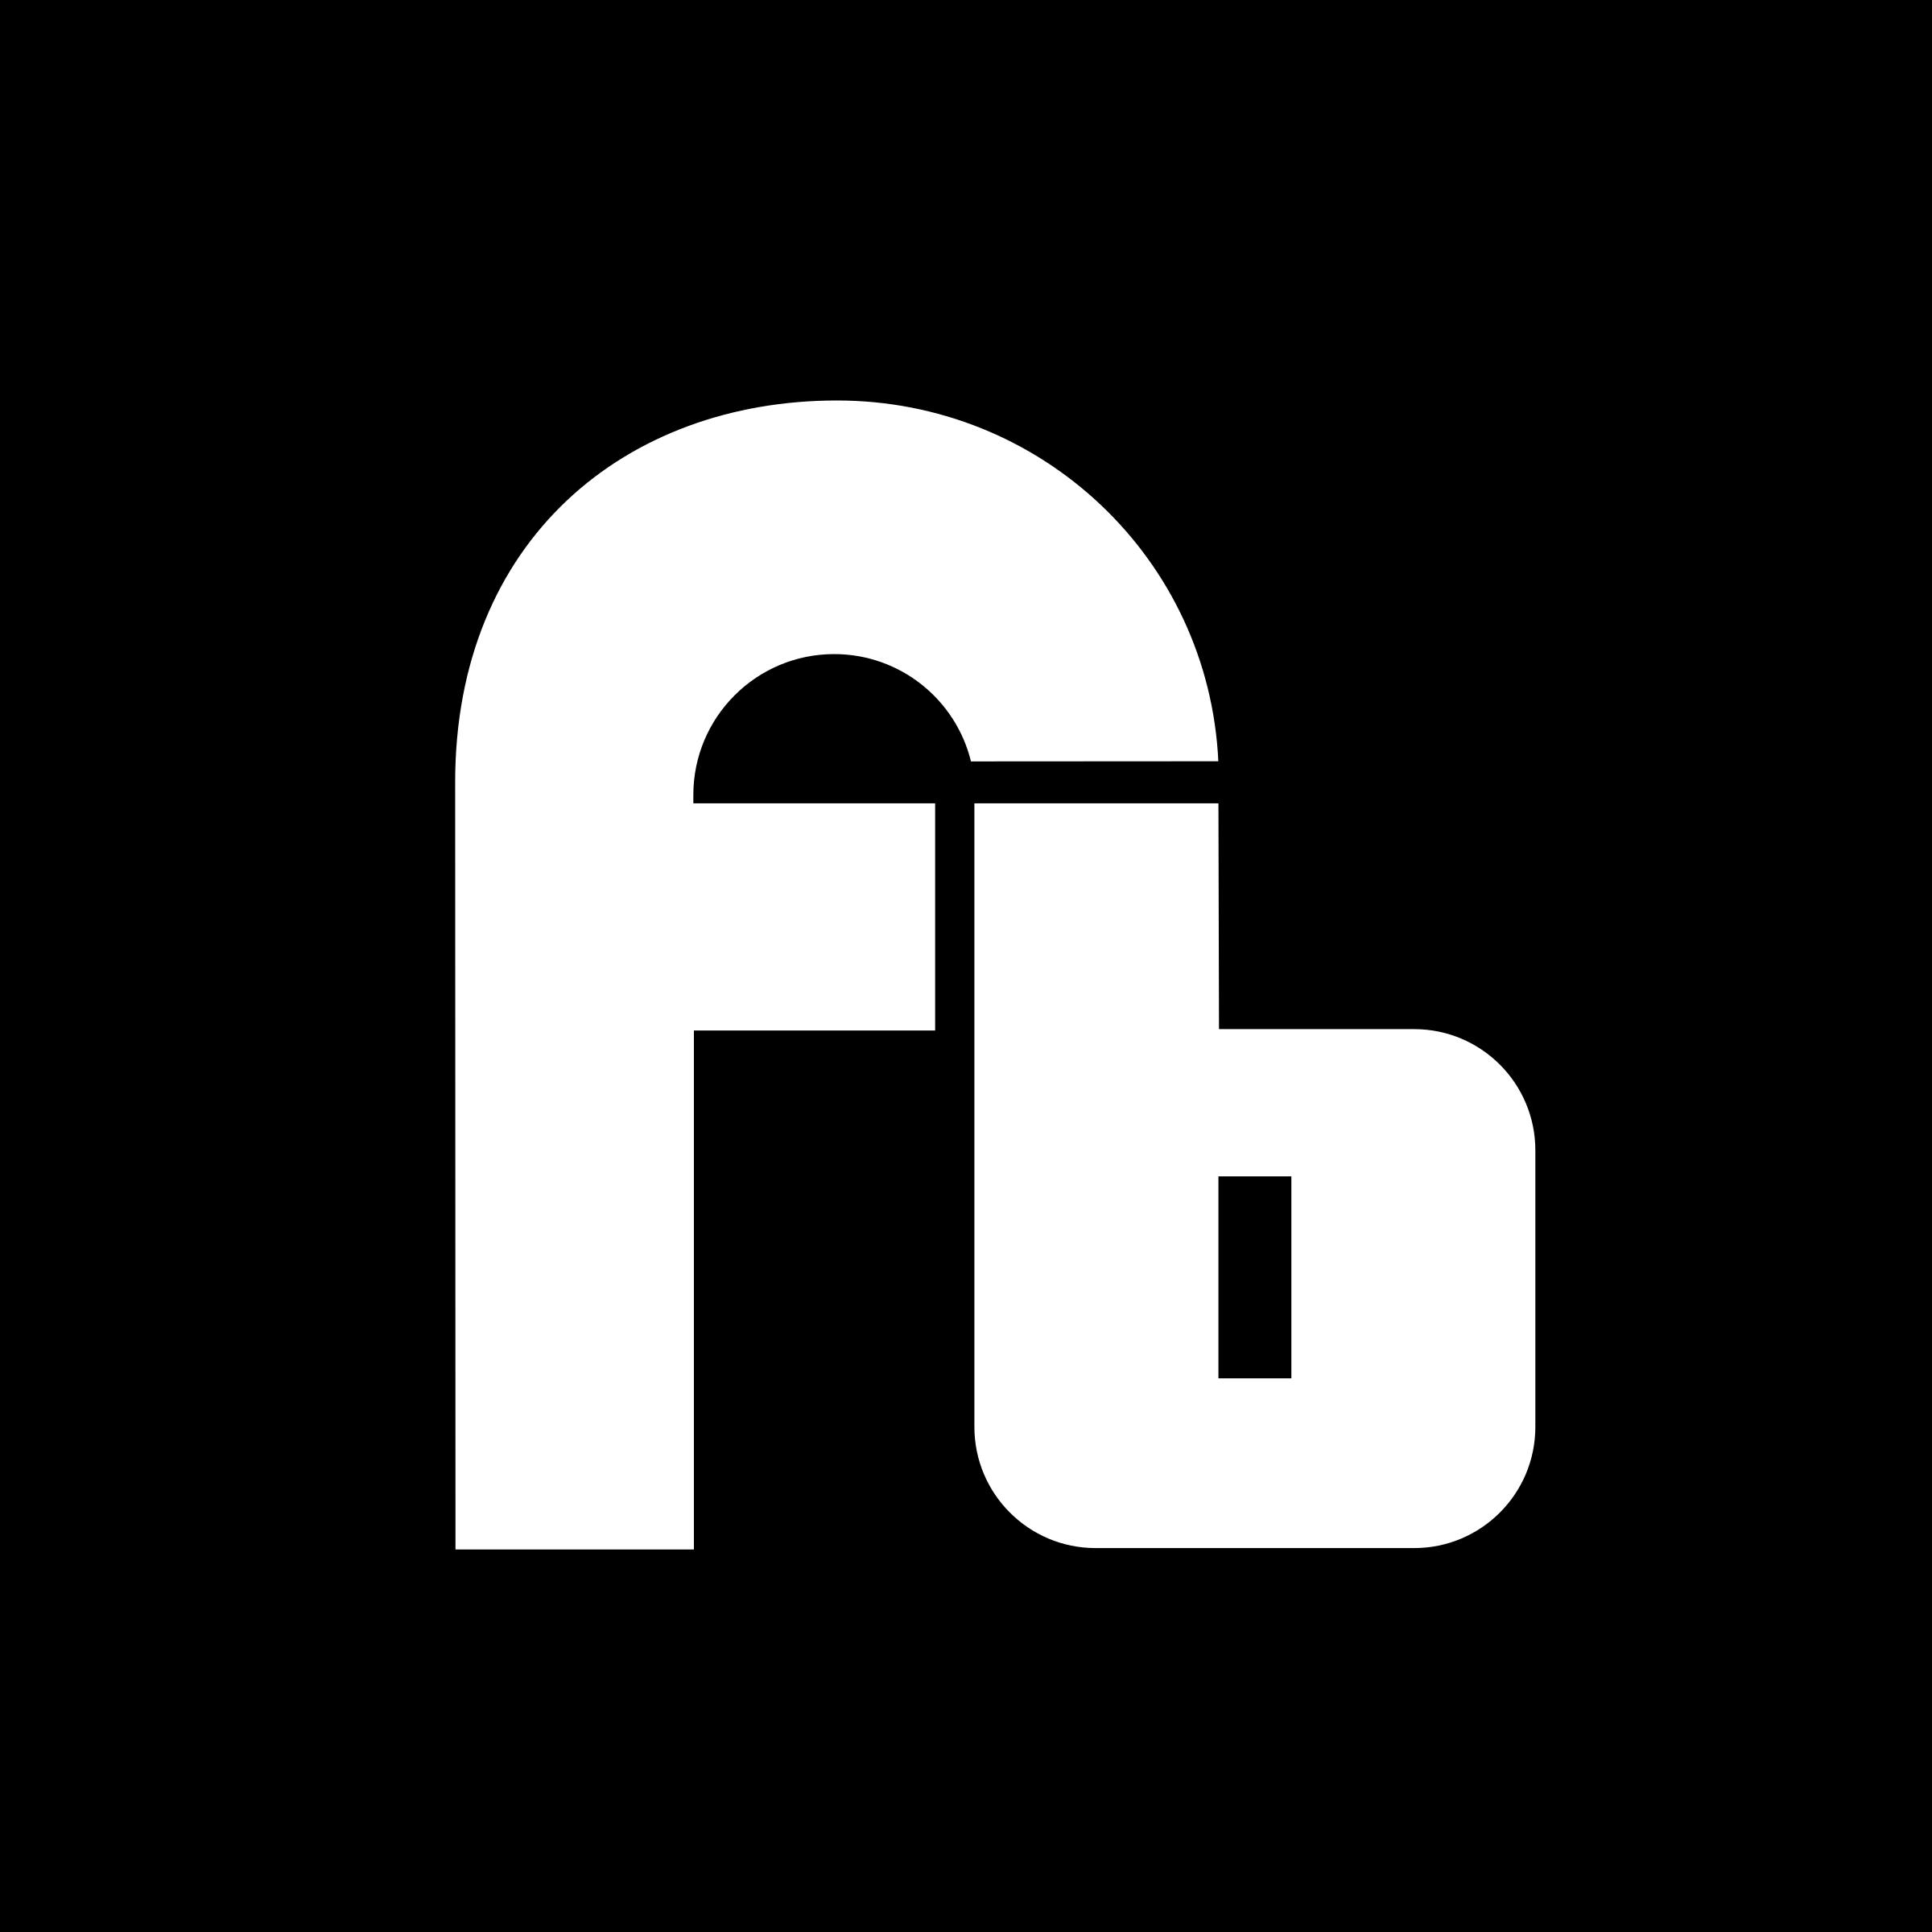 Fb logo png transparent svg vector freebie supply fb logo png transparent stopboris Images